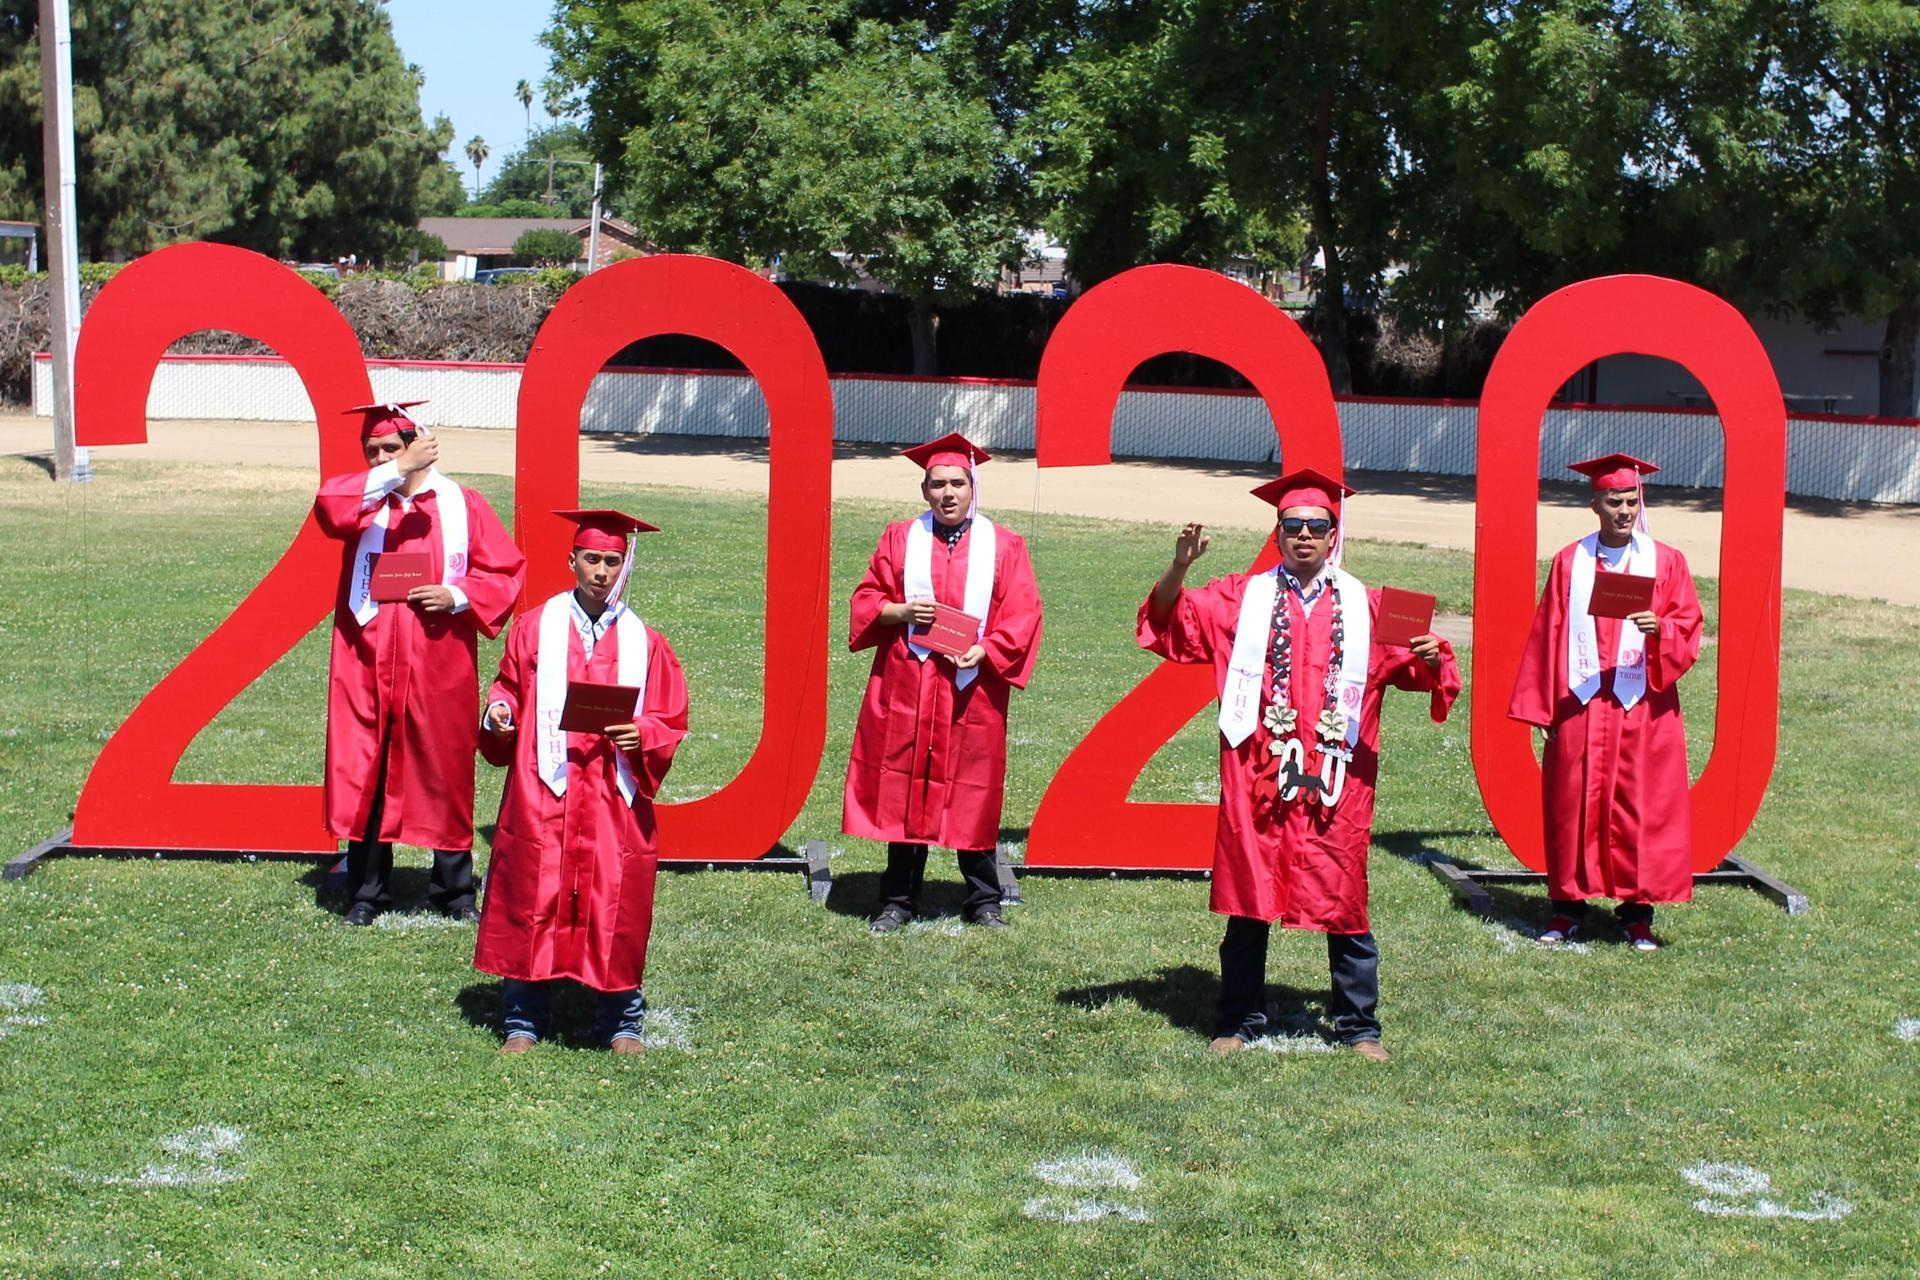 Left to right, Cesar Rojo Perez, Brian Lara, Daniel Christobal Naranjo, Miguel Lara, and Oscar Orozco turning their tassels